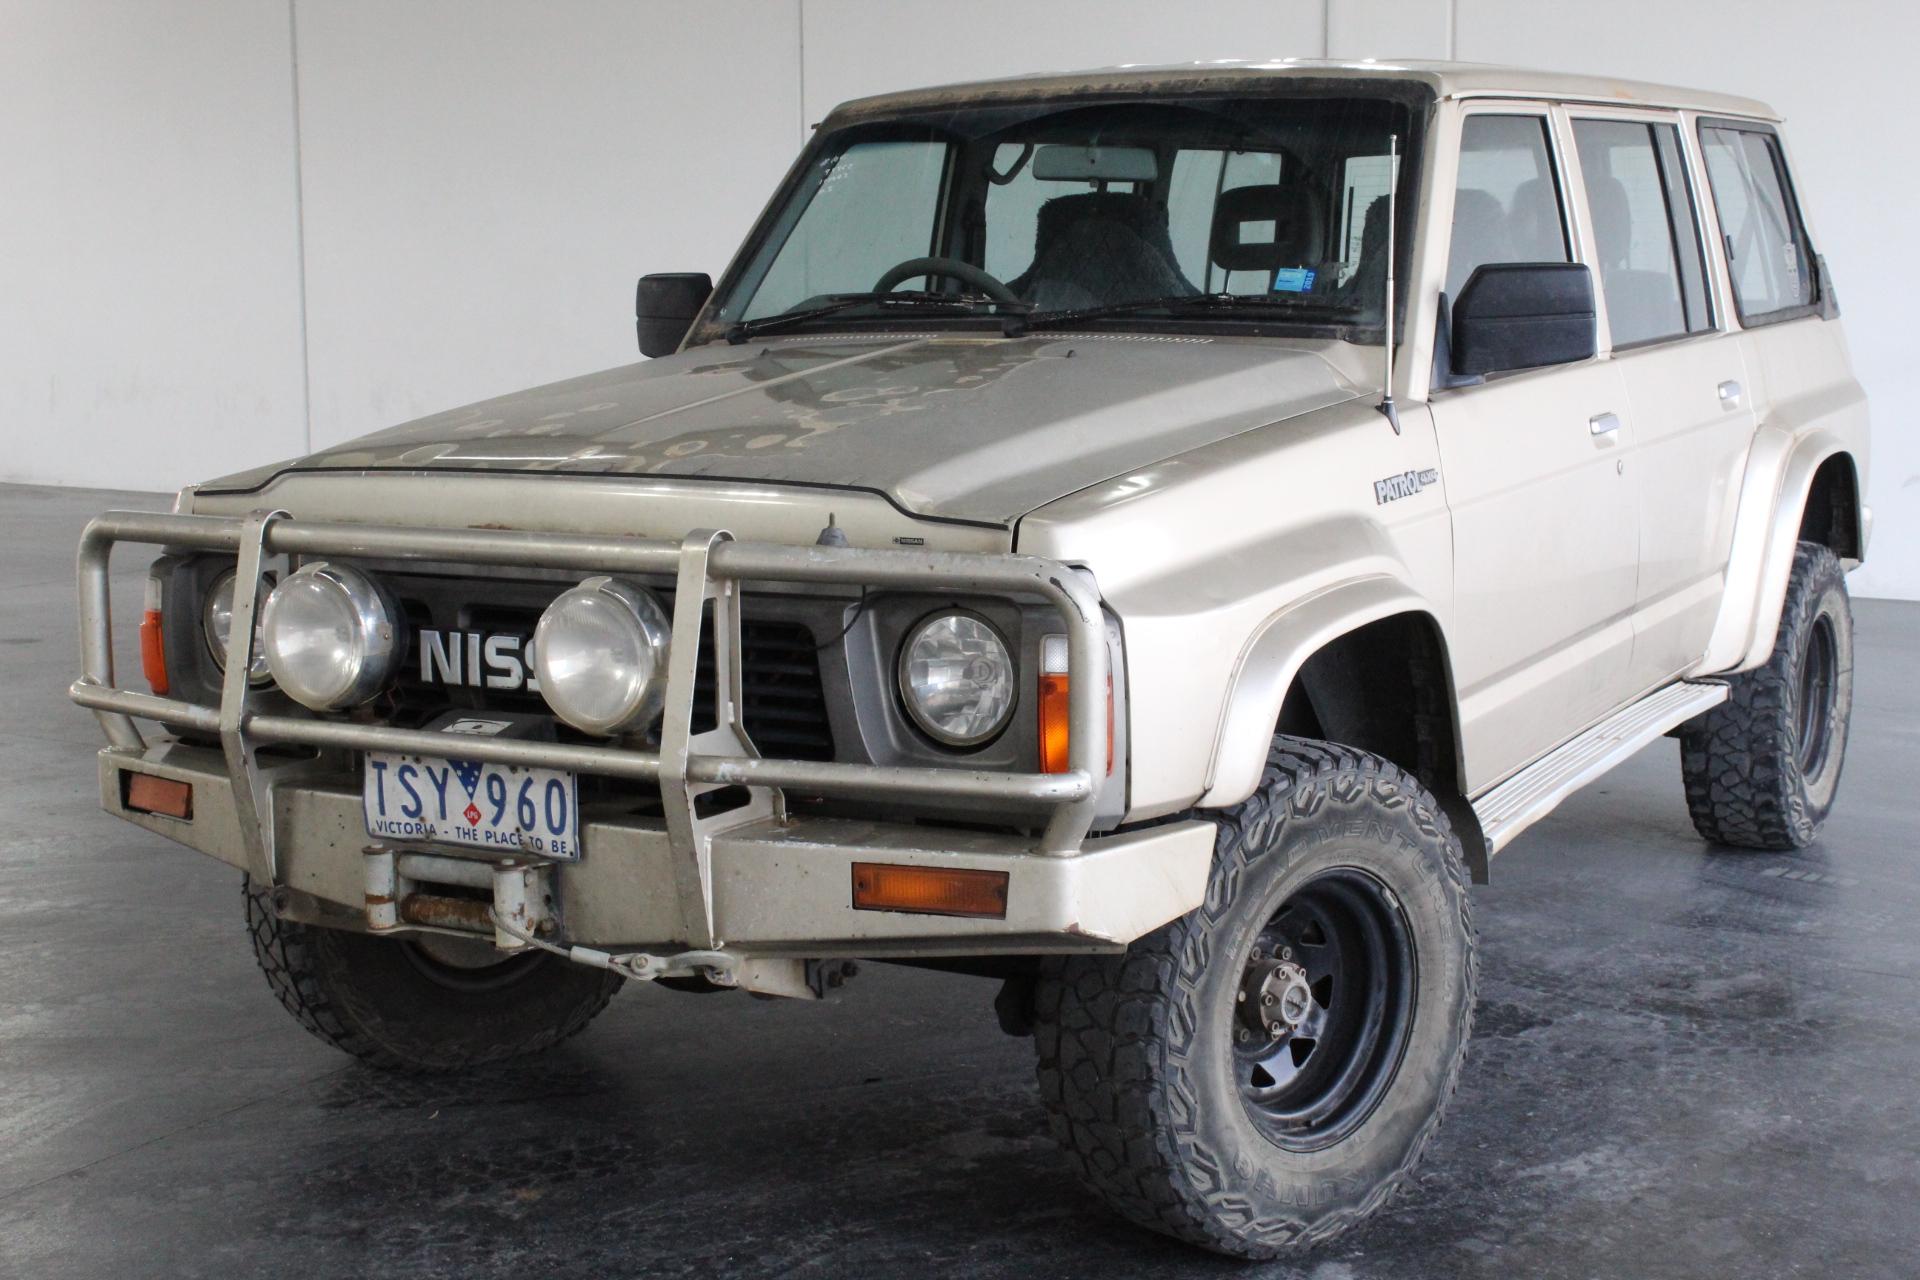 1991 Nissan Patrol Automatic 7 Seats 4WD